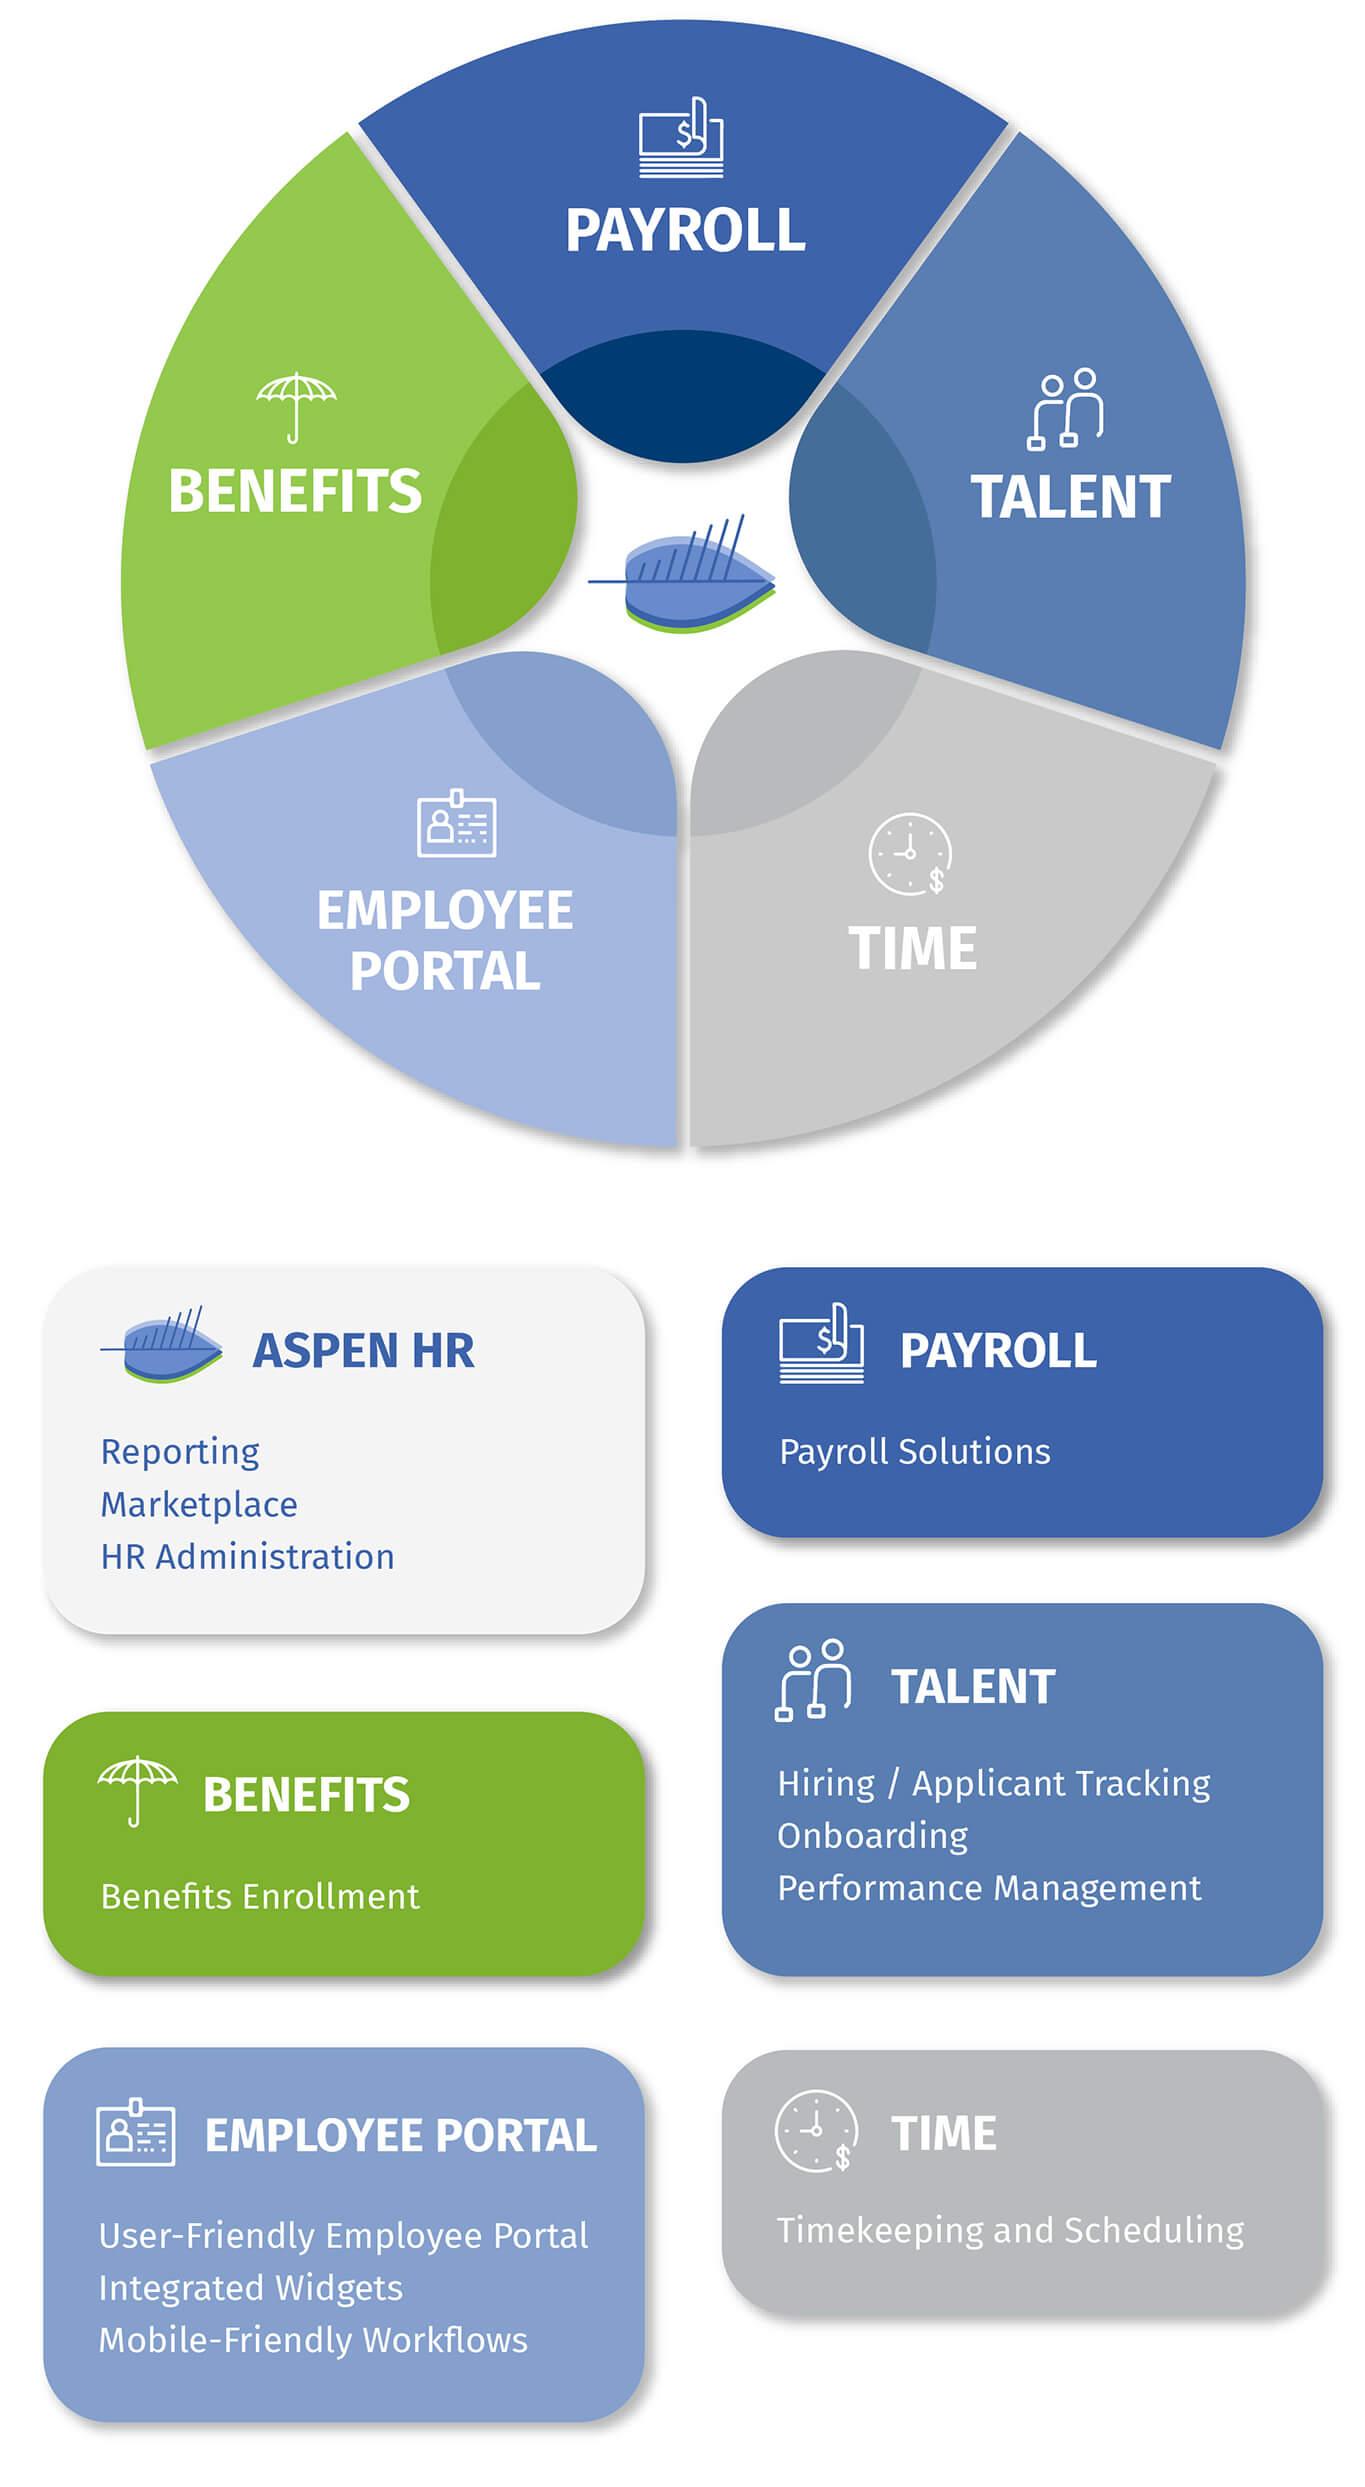 Best Payroll Platform